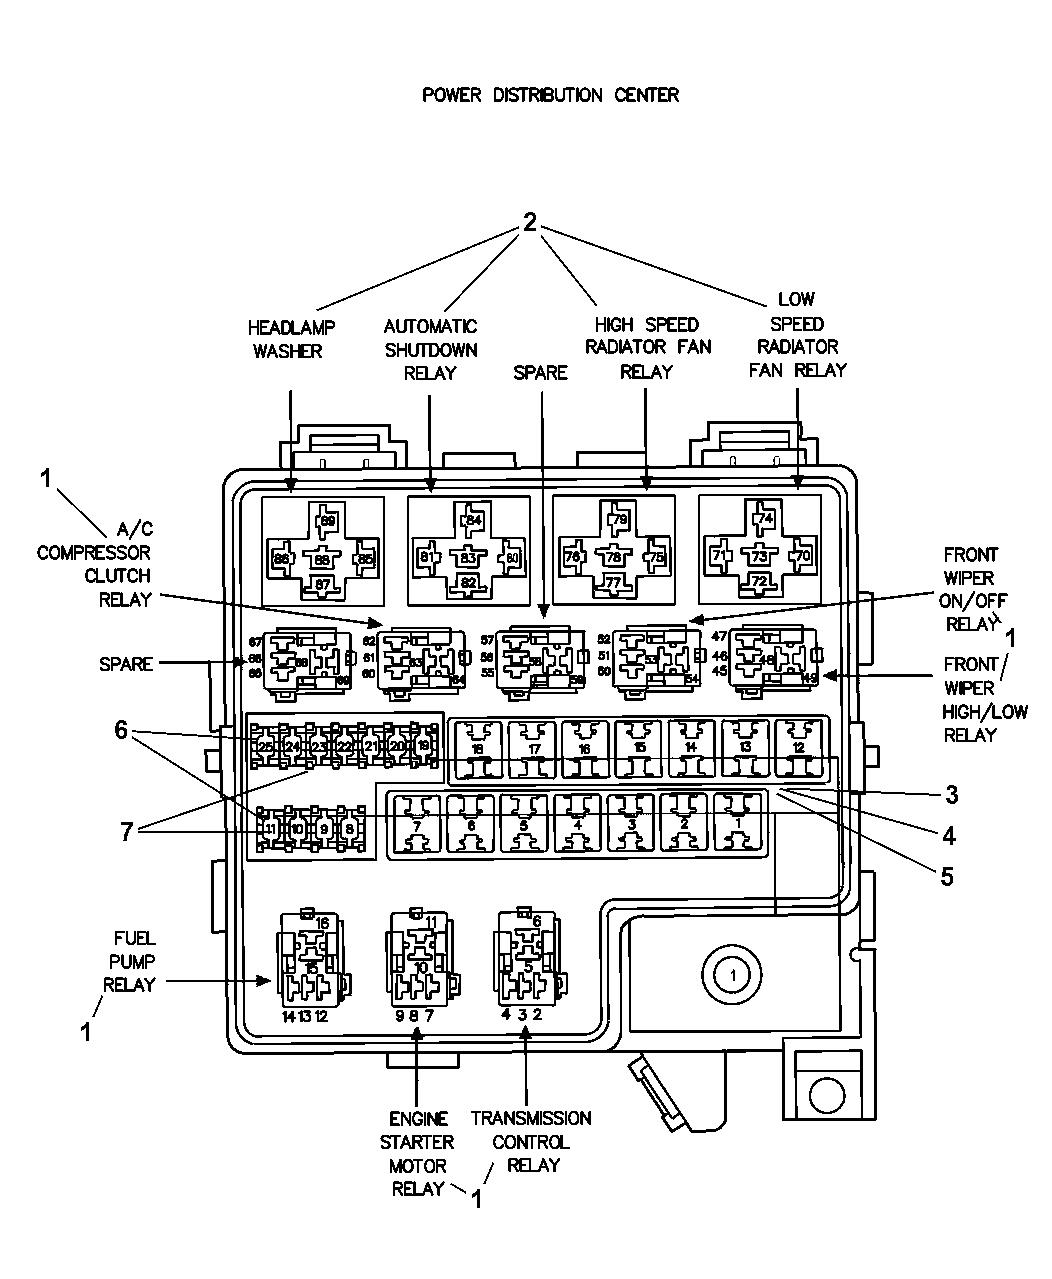 Relay Wiring Diagram 04 Sebring Convertible Library For 2003 Chrysler Sedan Power Distribution Center Relays